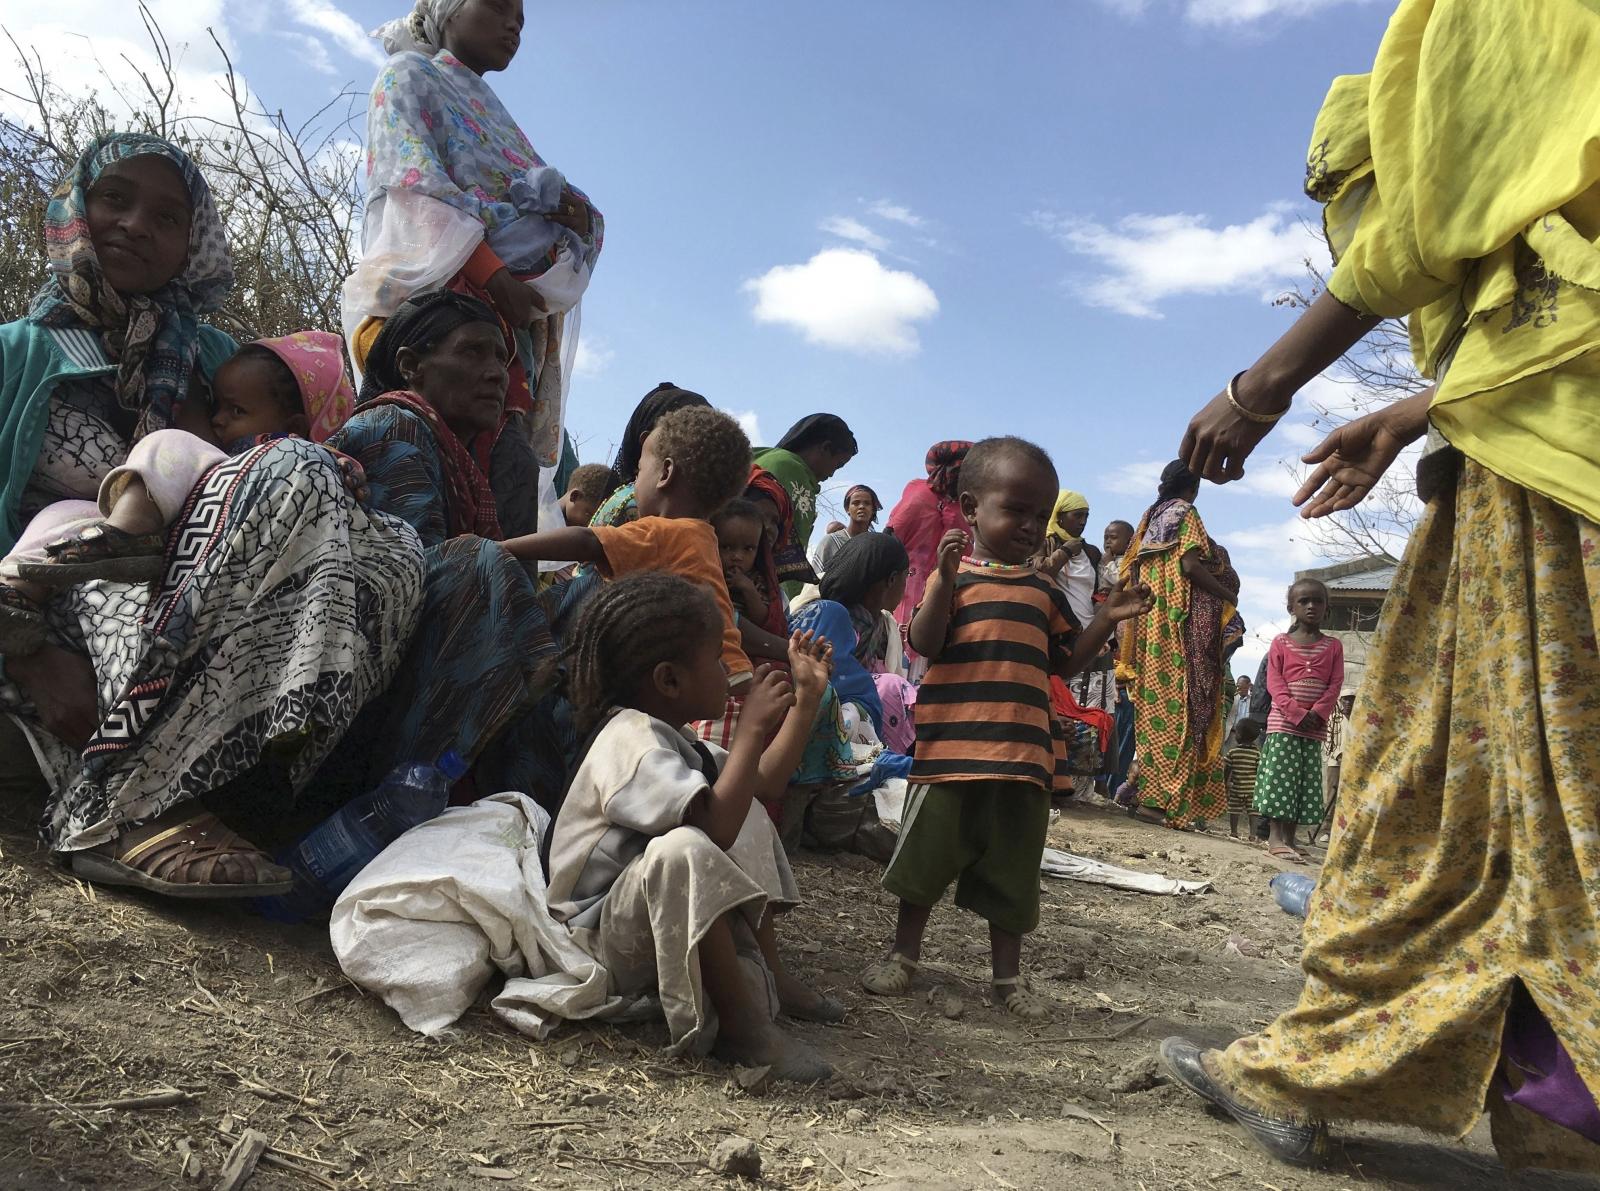 children unicef starving nigeria malnourished starvation malnutrition african africa ethiopia borno village hundreds hampers drive double number halo haram boko